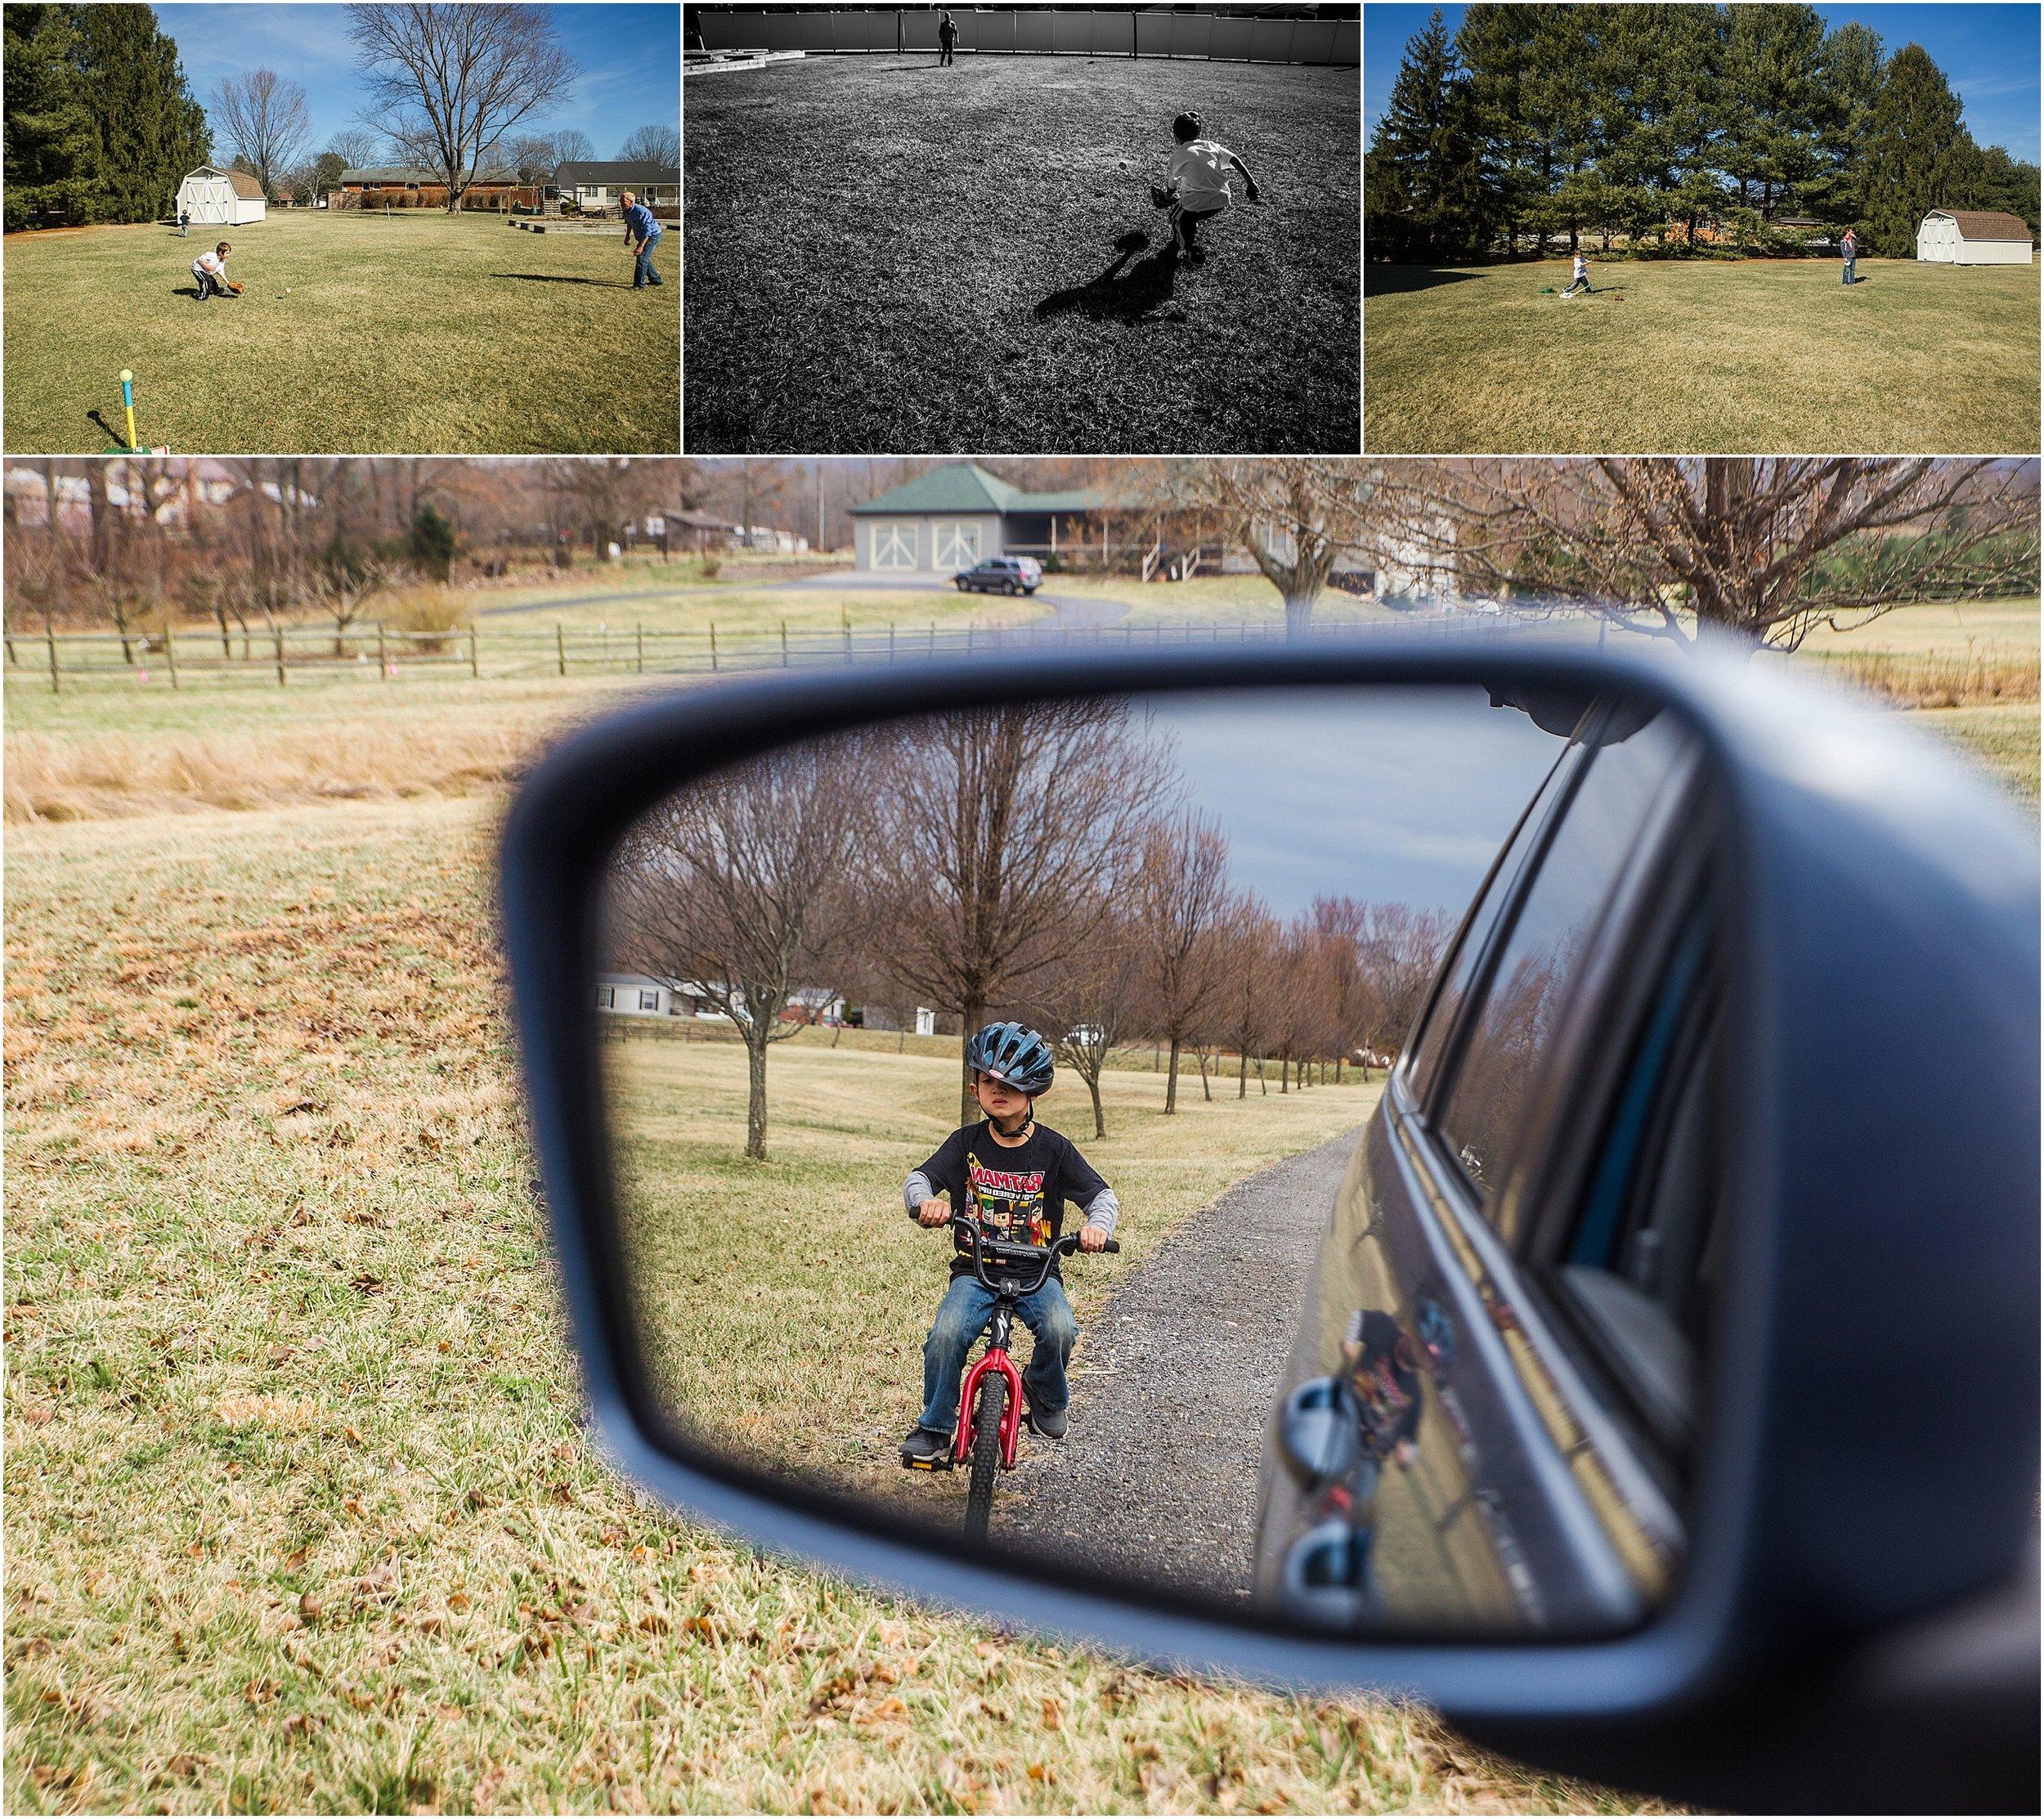 boy on bike and baseball Holli Pool Photography Stuarts Draft Virginia